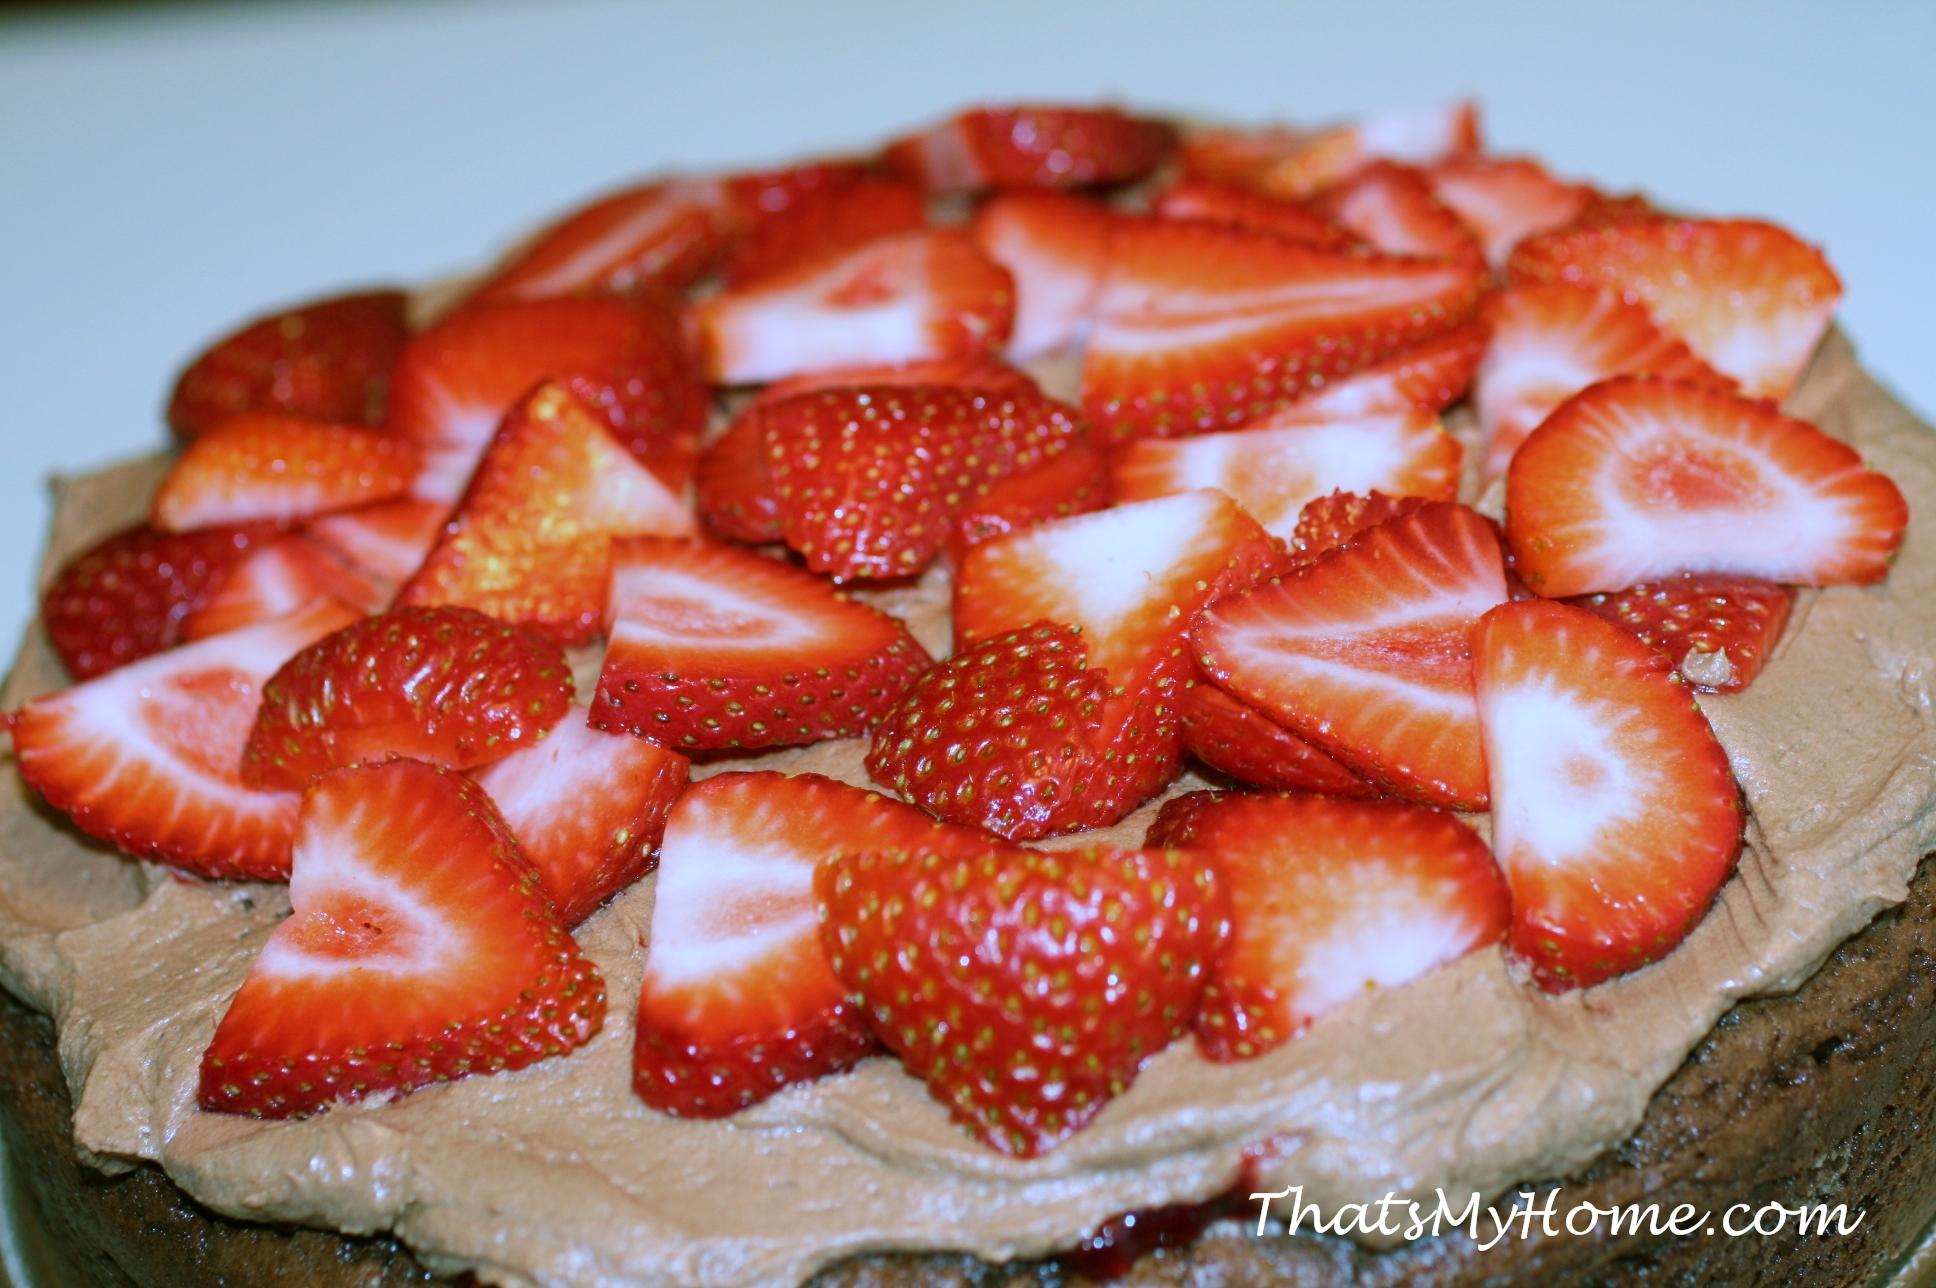 Chocolate Cake Filling Using Strawberry Jam